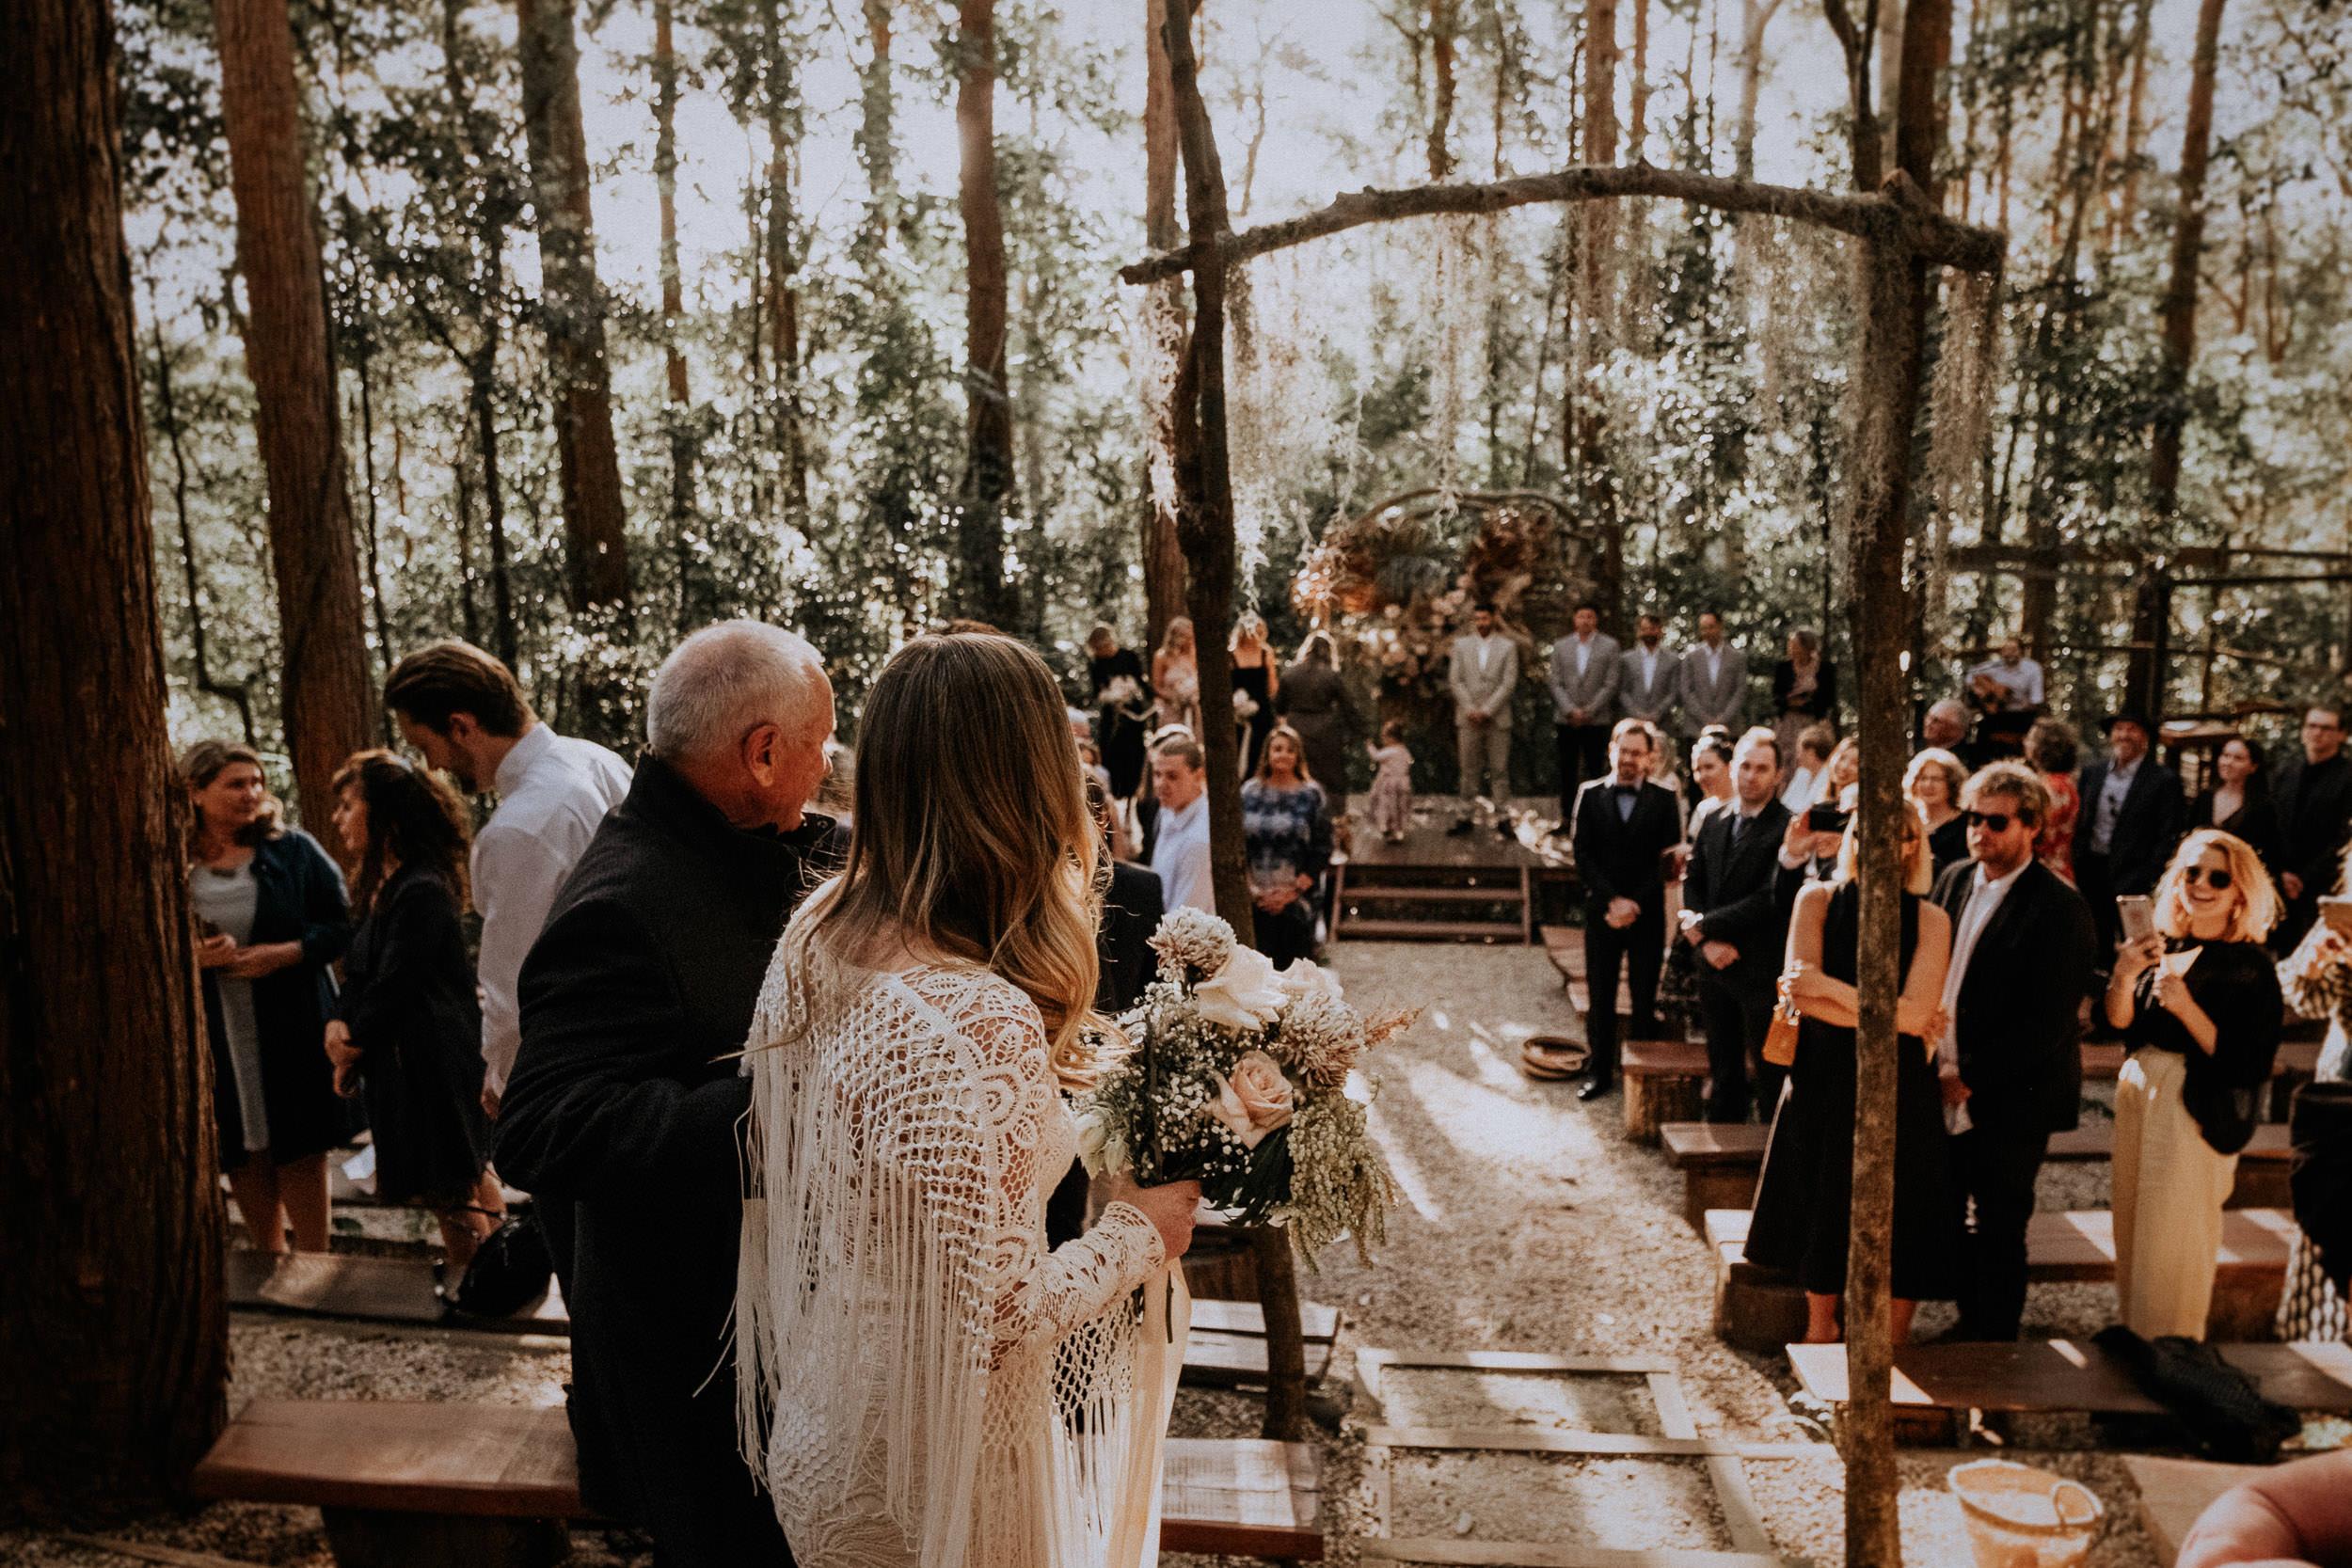 S&A Elopement - Kings & Thieves - Shred 'Til Dead - Central Coast Beach Forest Wedding - 164.jpg